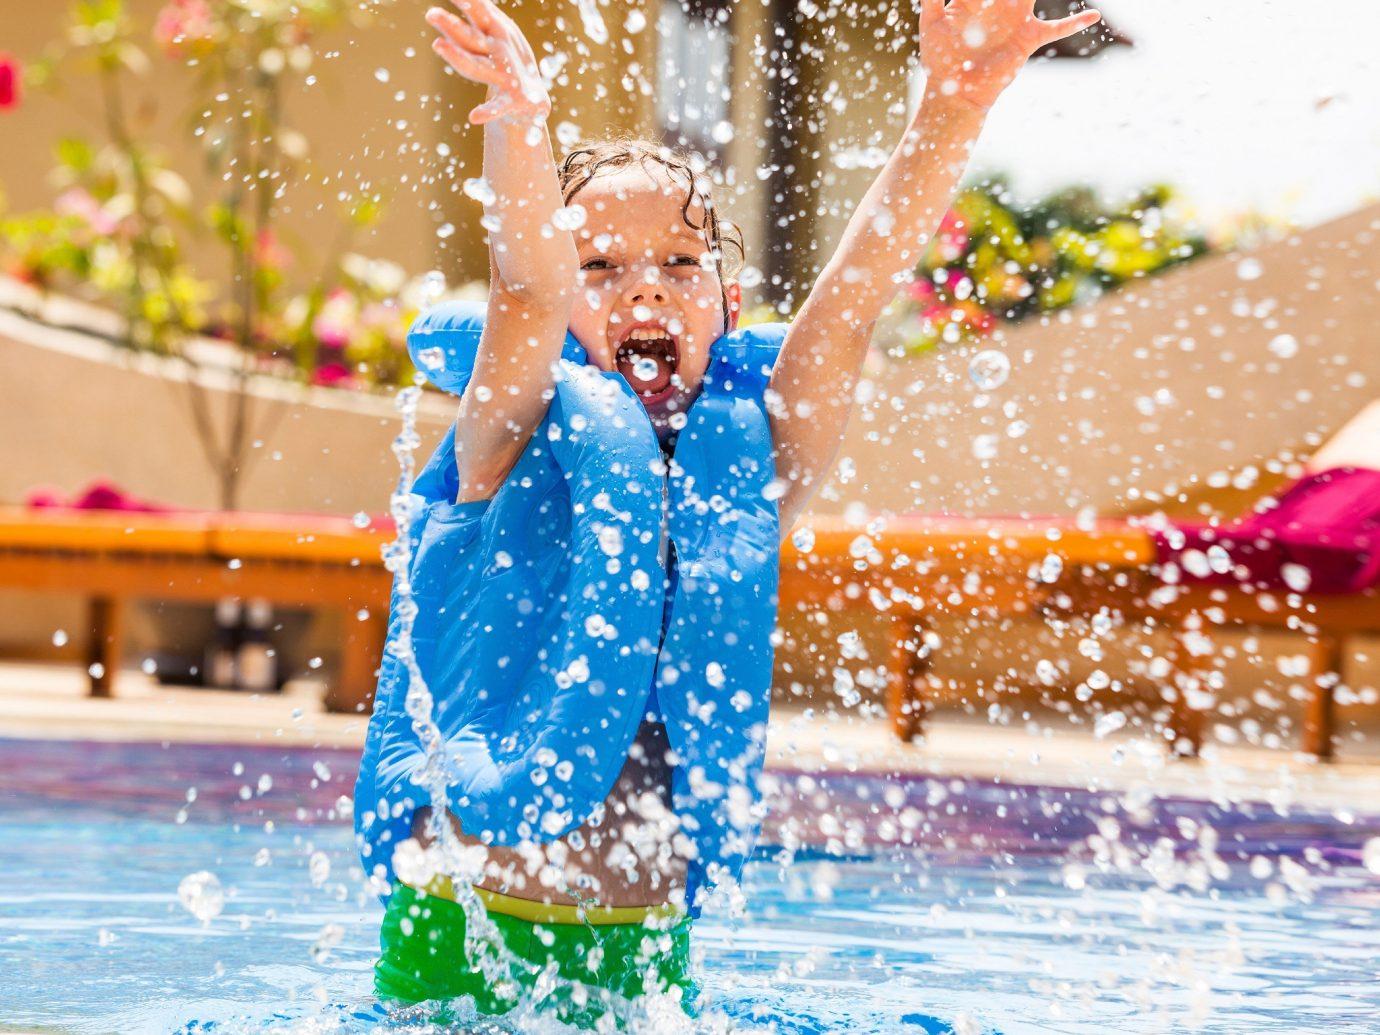 Offbeat leisure Water park water sport season Sport vacation Play outdoor recreation amusement park swimming